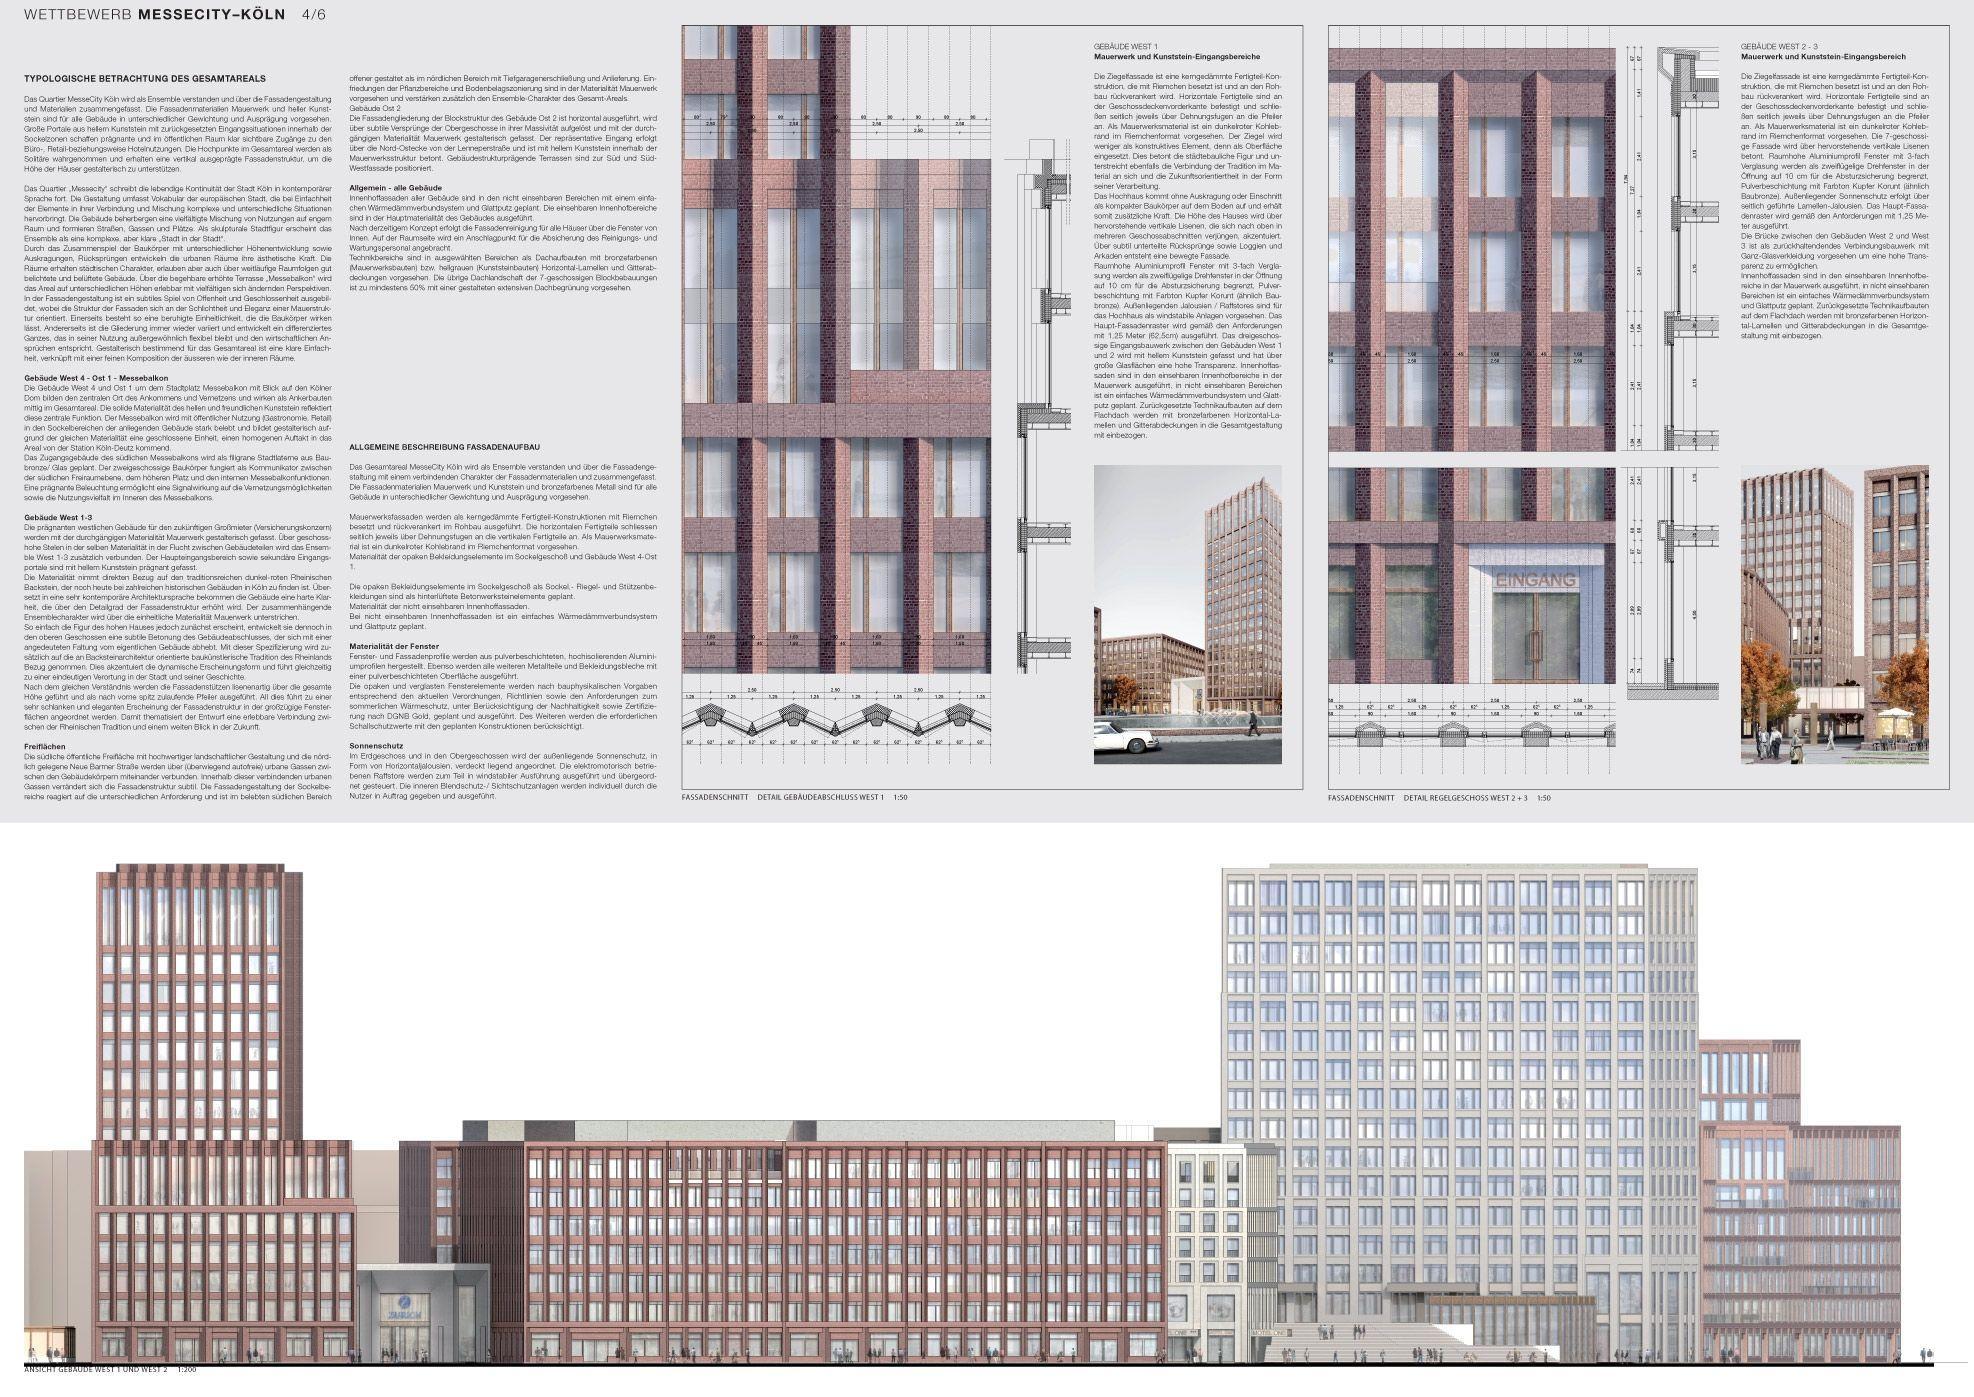 Sieger Hochhaus C Max Dudler Strabag Real Estate Ece Architecture Skyscraper Real Estate